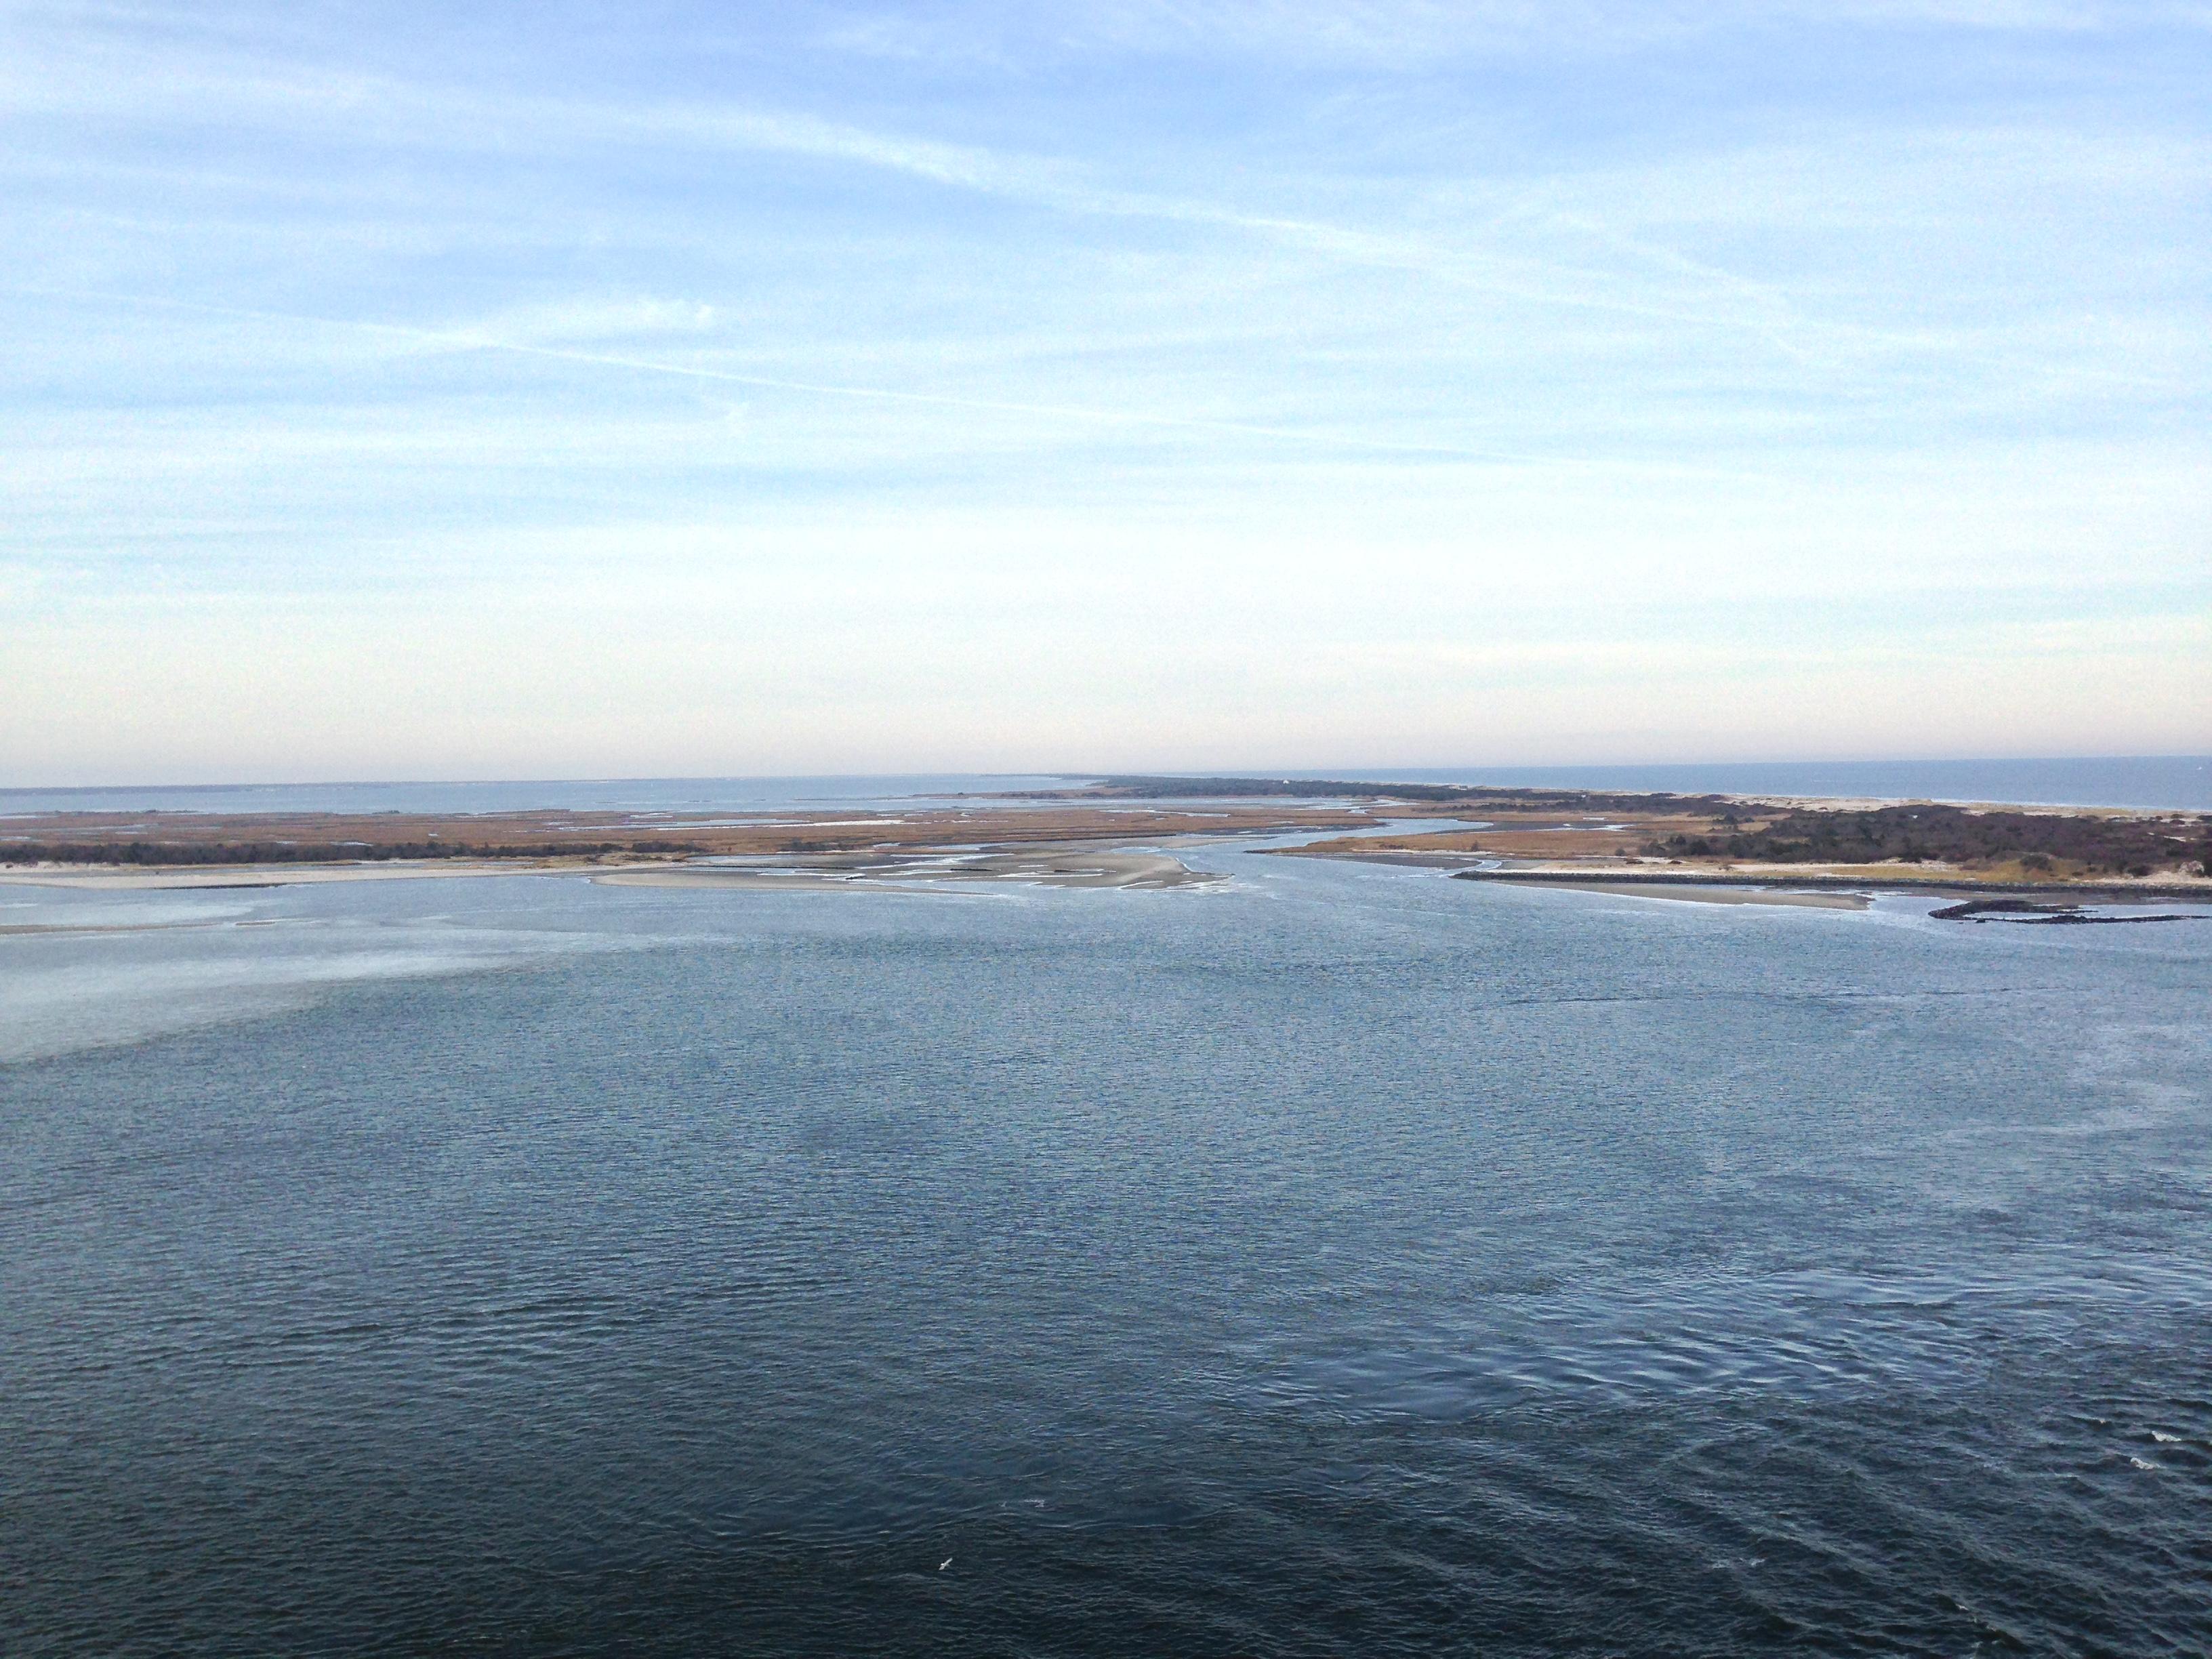 Barnegat Bay and the Atlantic Ocean from the top of Barnegat Lighthouse. (Photo: Daniel Nee)